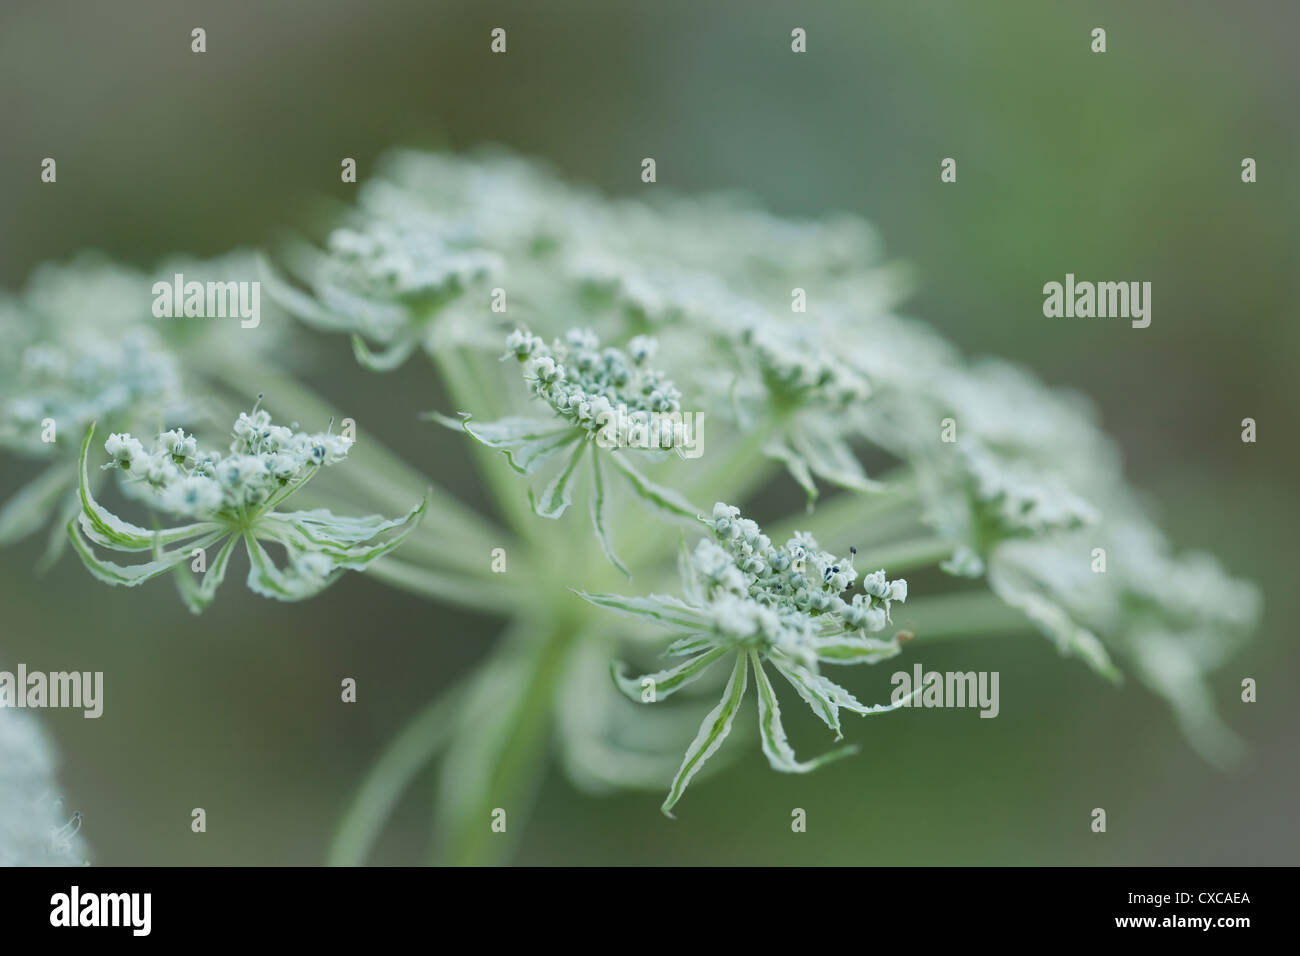 Selinum Wallichianum White Flowers September United Kingdom Stock